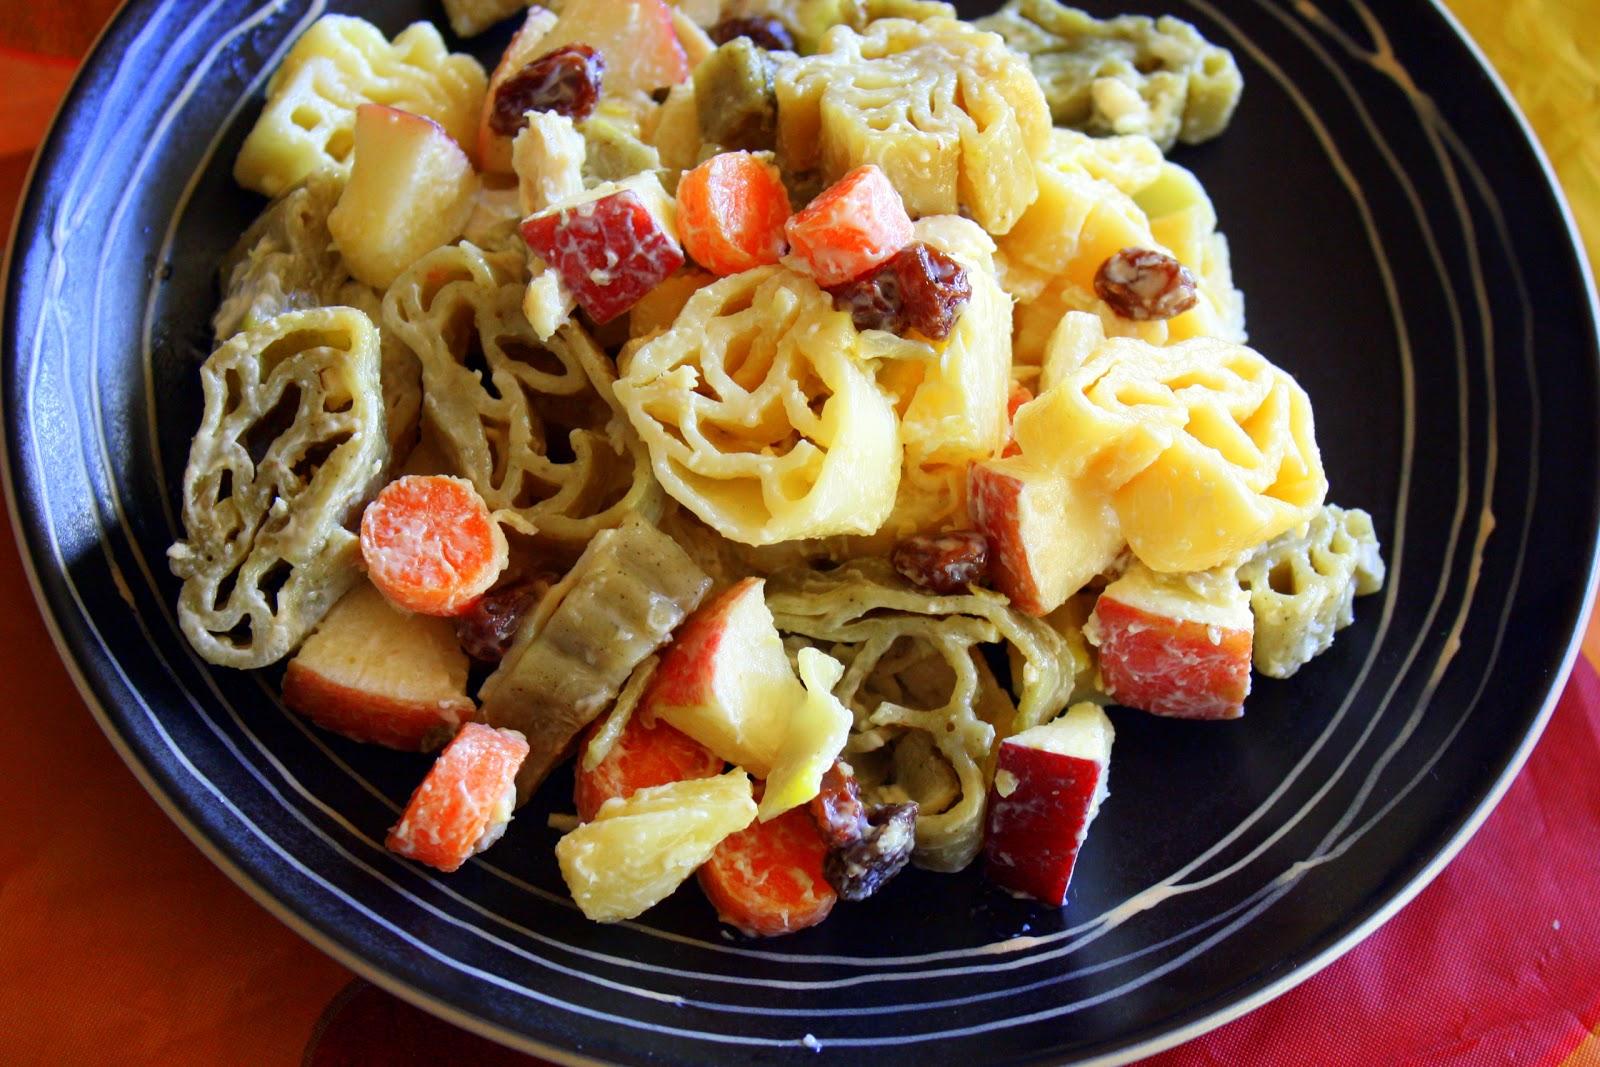 Fruity Chicken Pasta Salad (aka Pinoy macaroni salad)